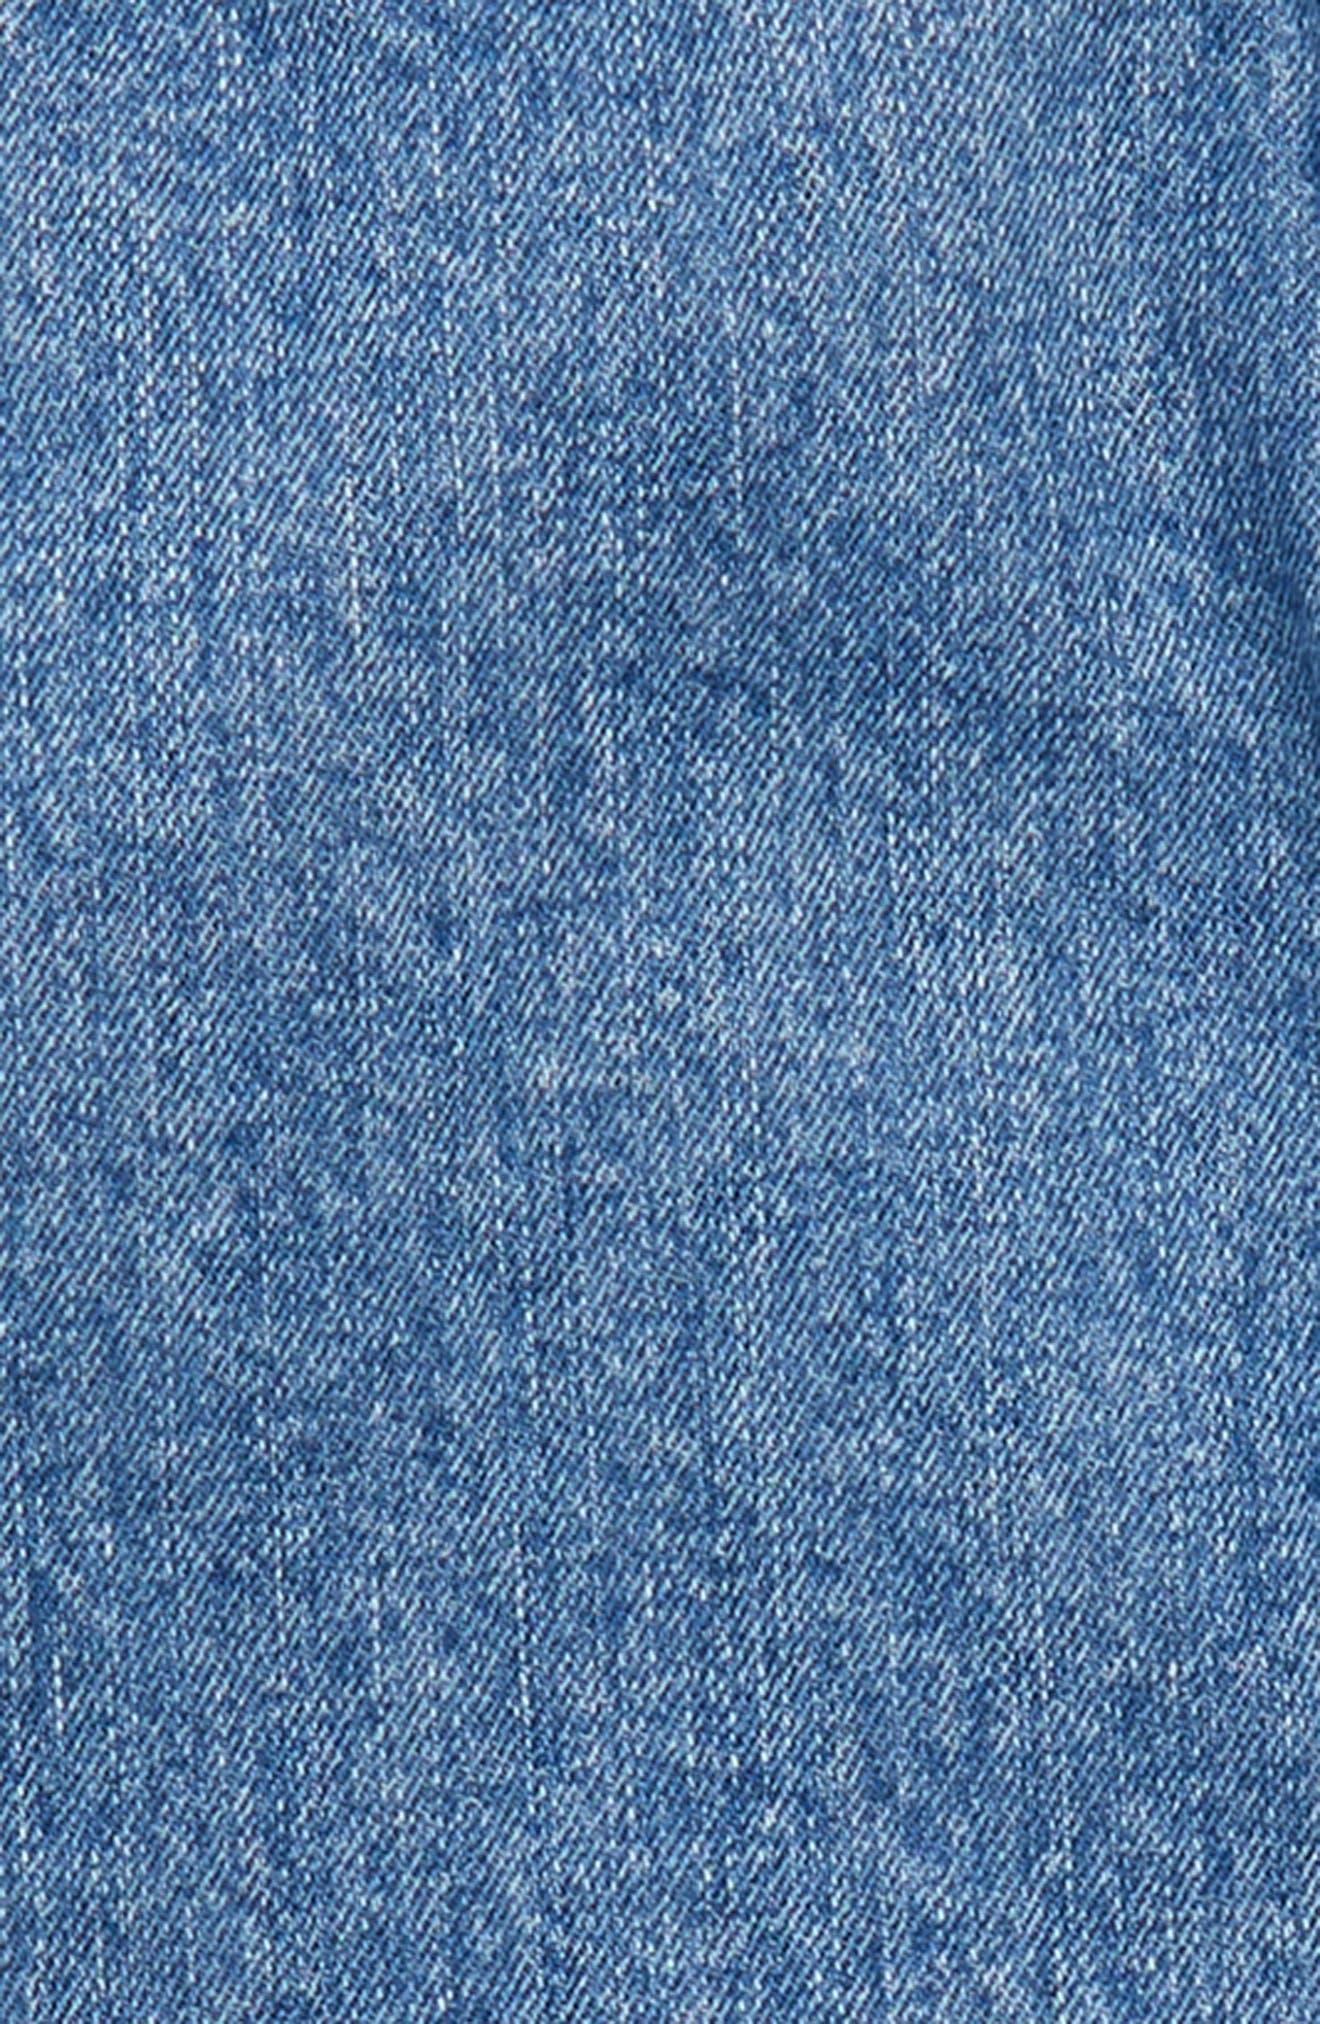 Alternate Image 3  - Maddie Embroidered Denim Skirt (Big Girls)